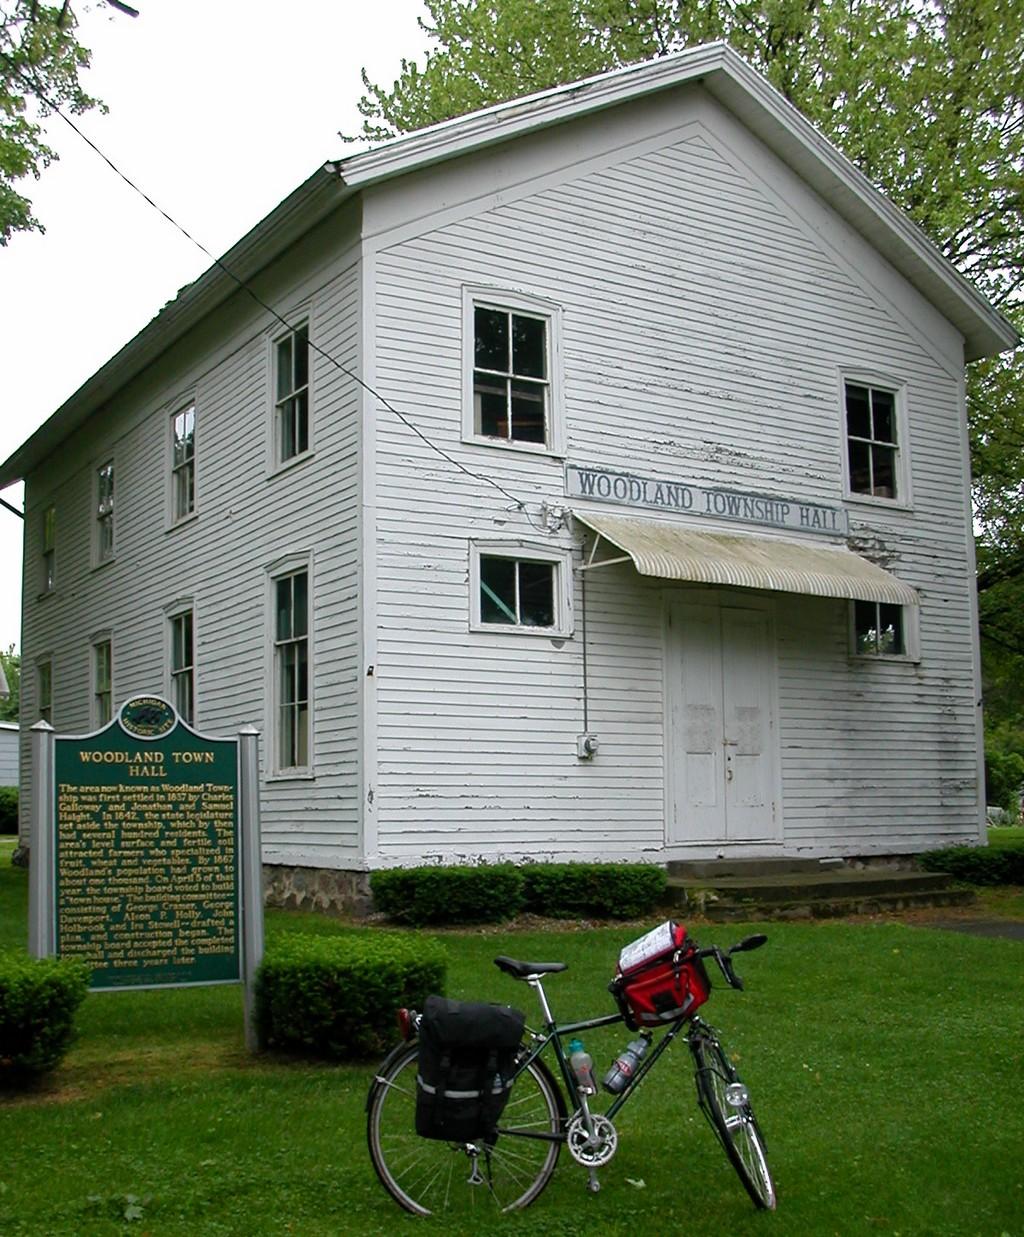 Township halls